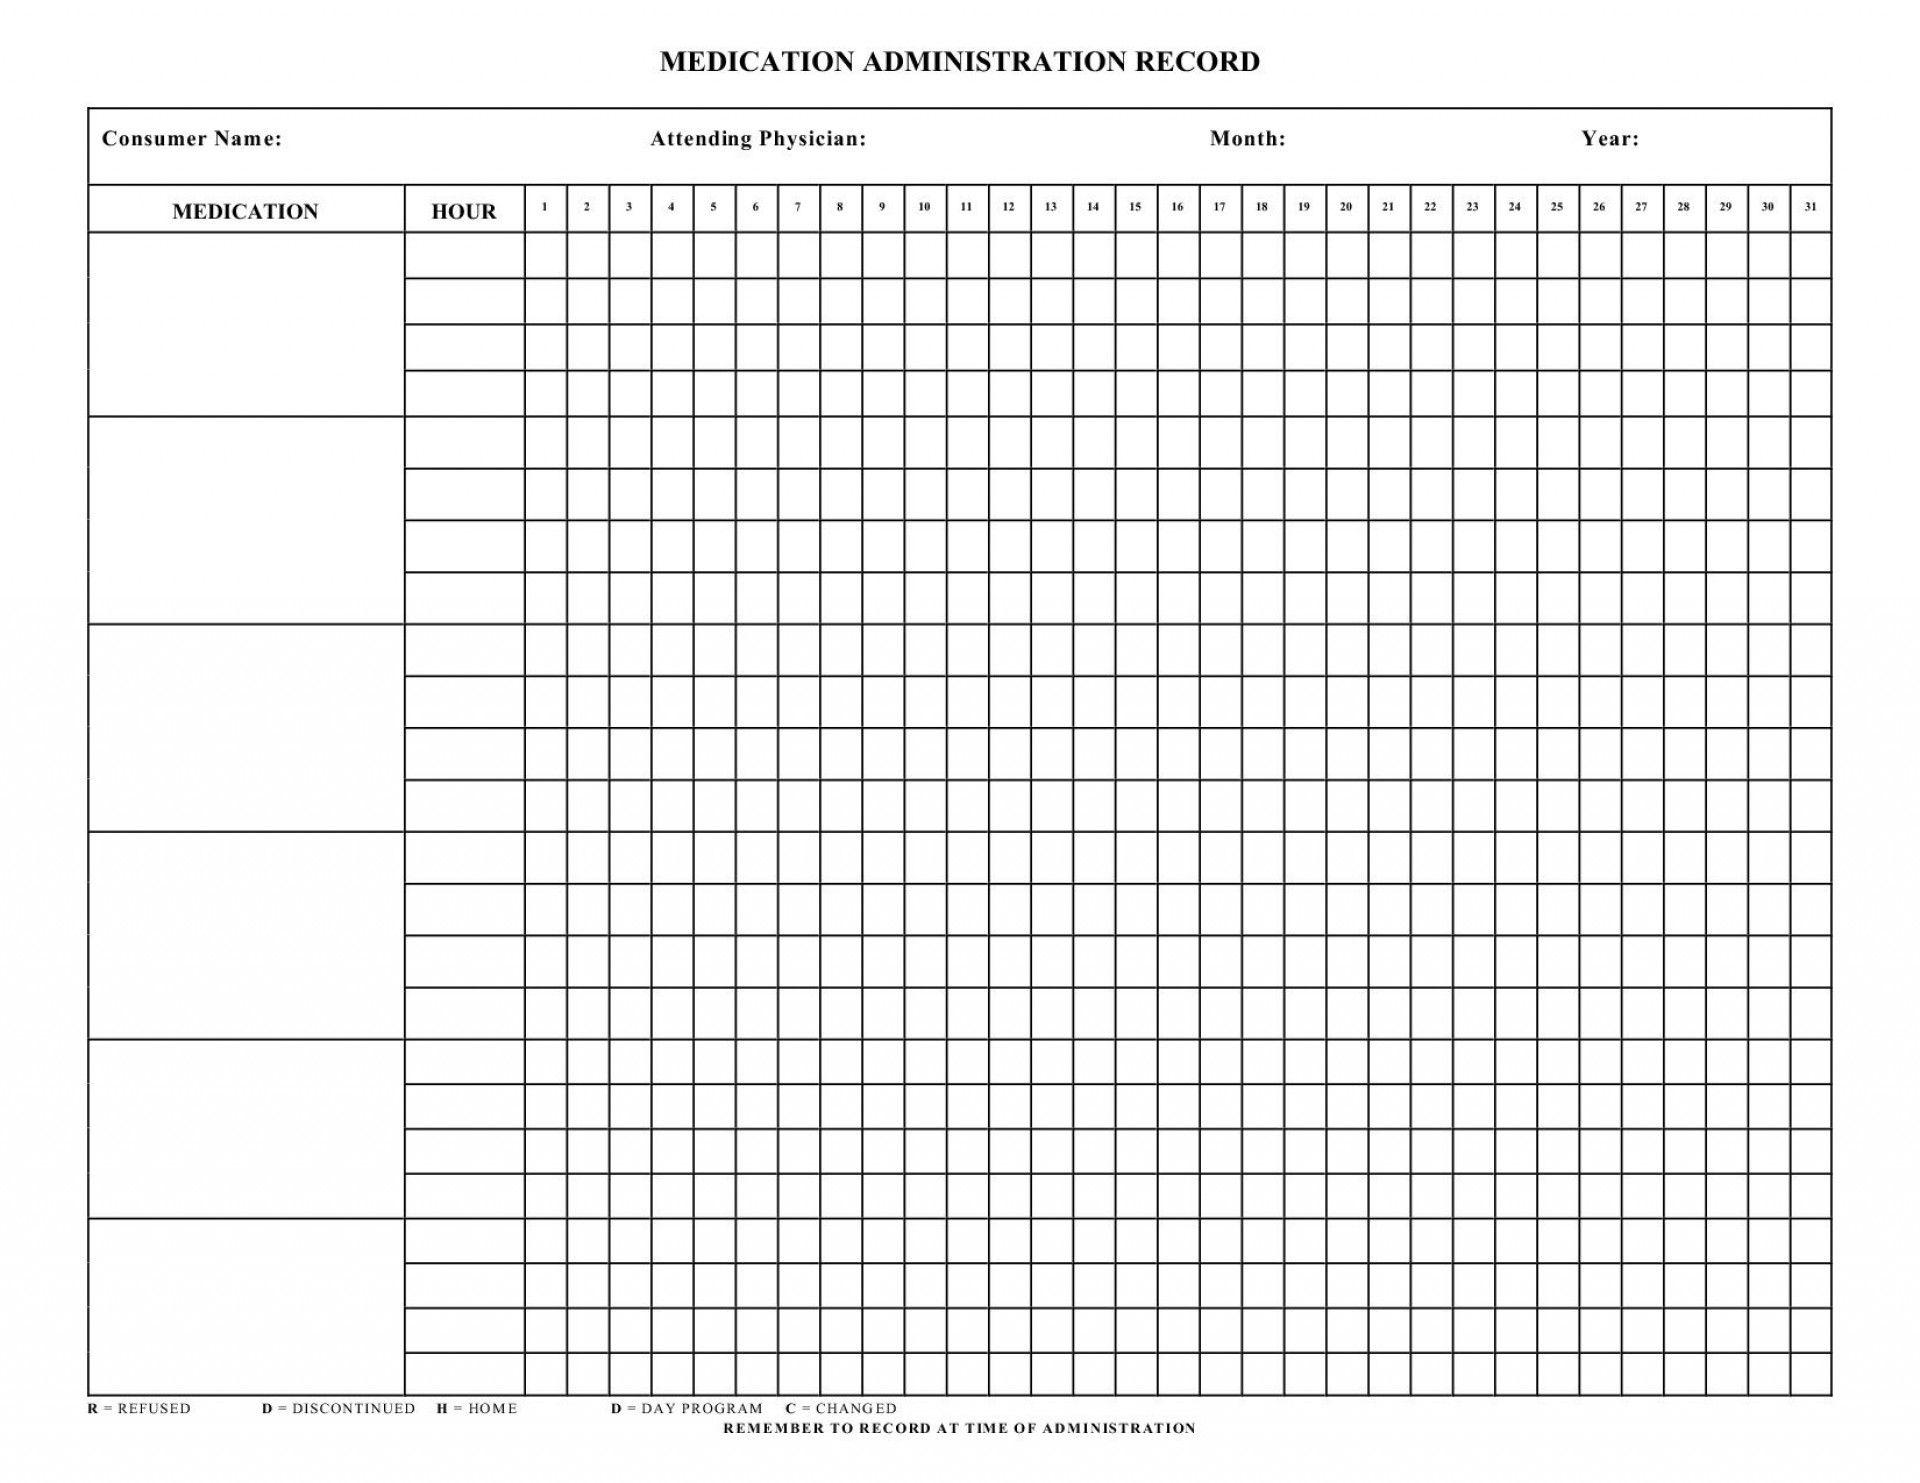 002 Fascinating Medication Administration Record Form Download Design Full